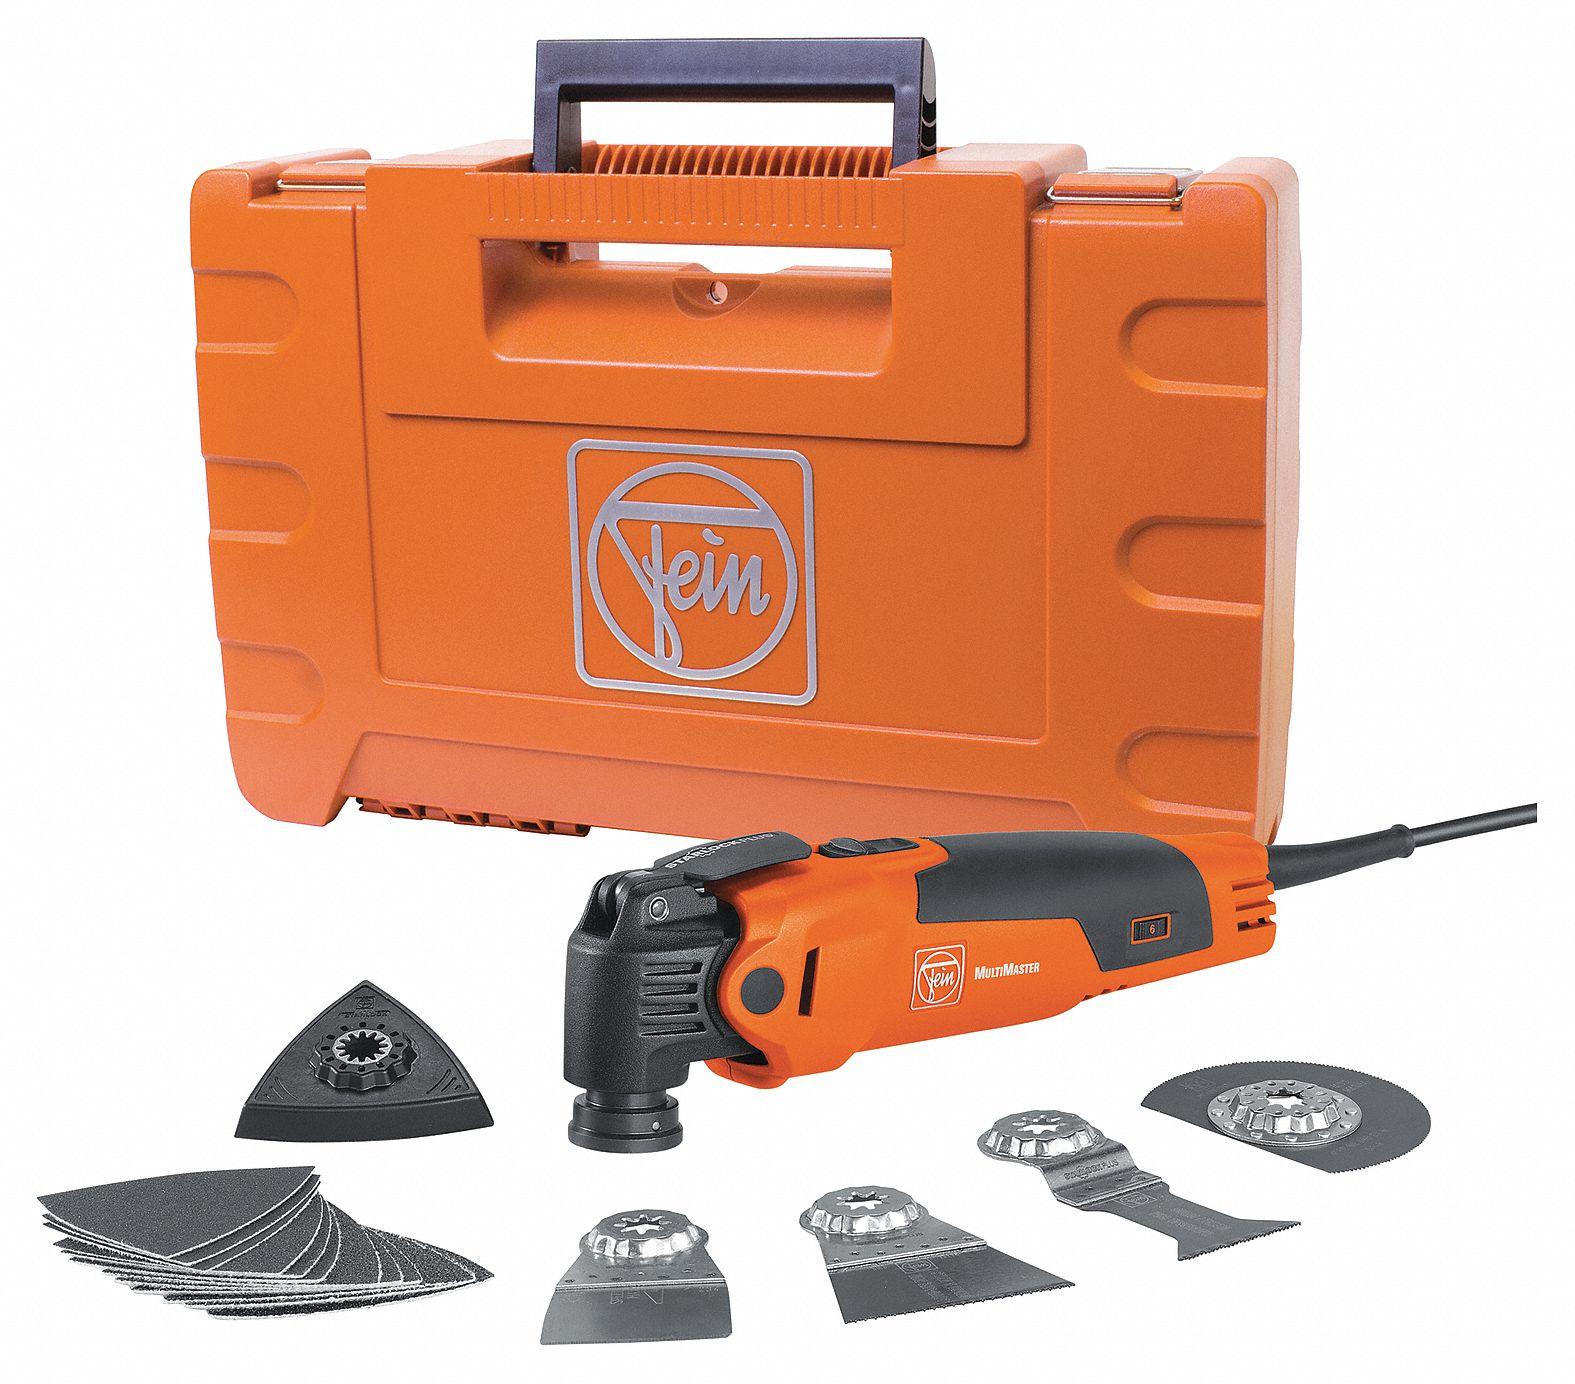 fein oscillating multimaster tool kit 3 6amp 49wm31 fmm 350qsl quick start grainger. Black Bedroom Furniture Sets. Home Design Ideas